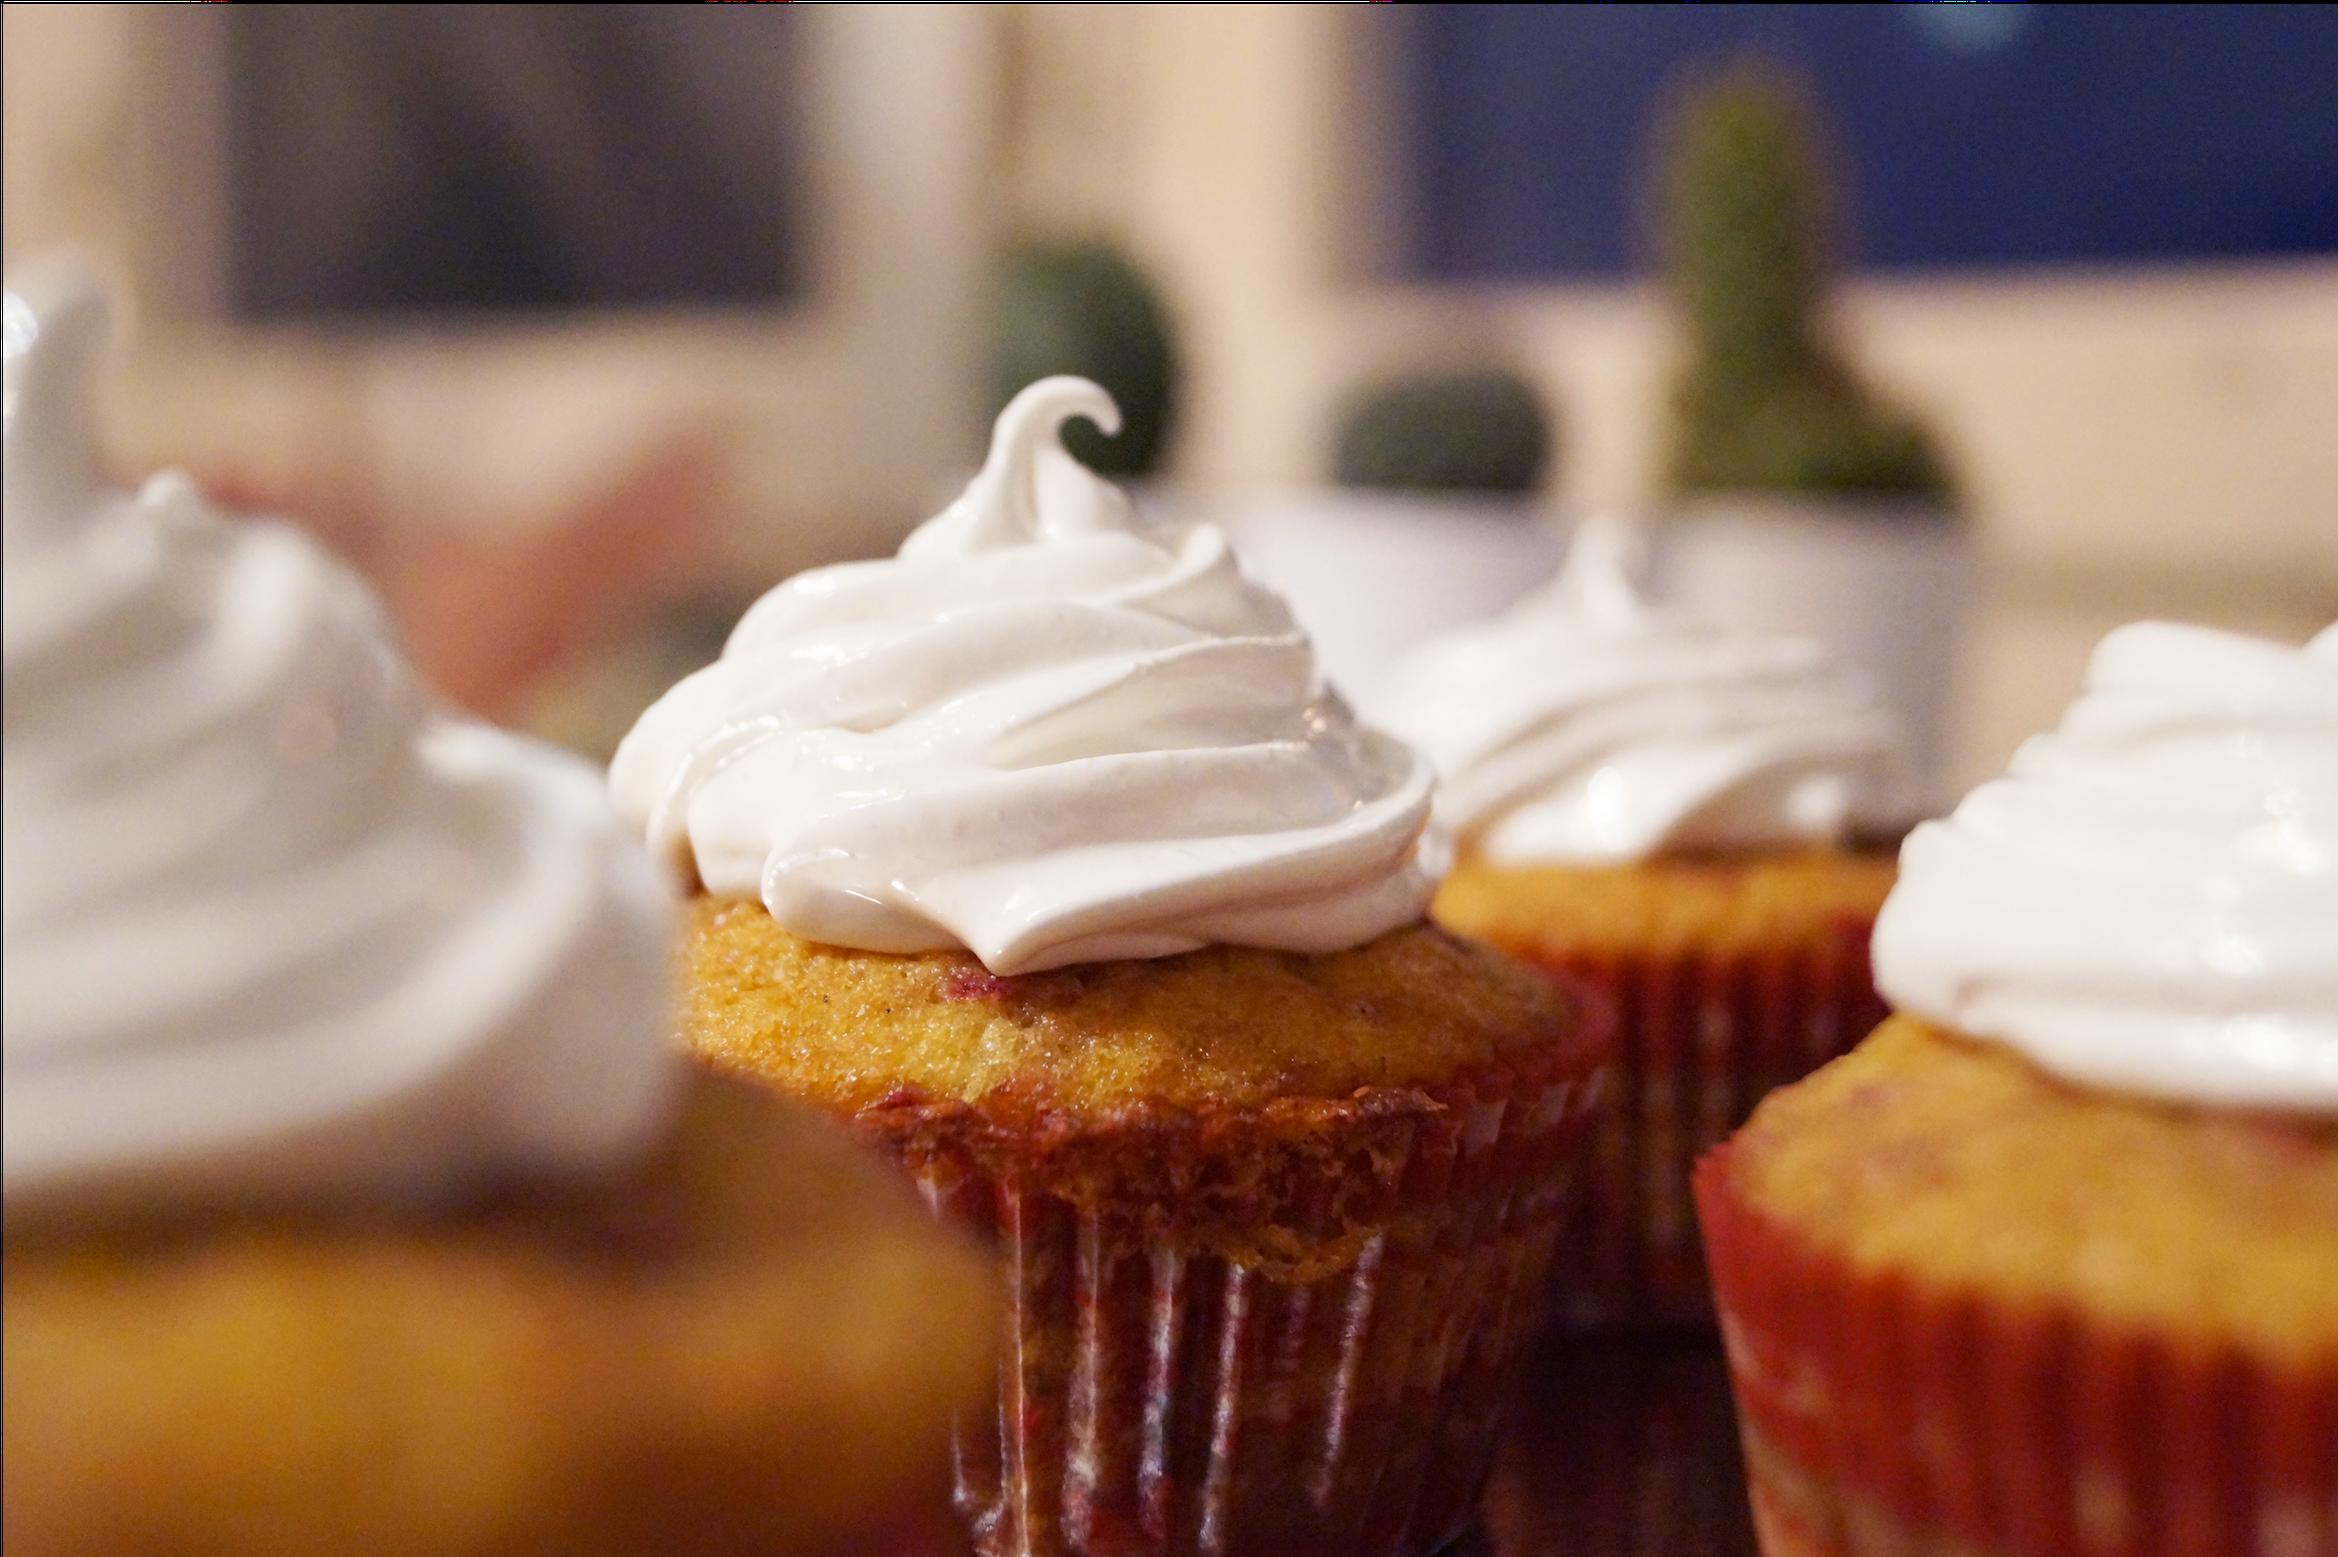 Cinnamon and Apple Cupcakes